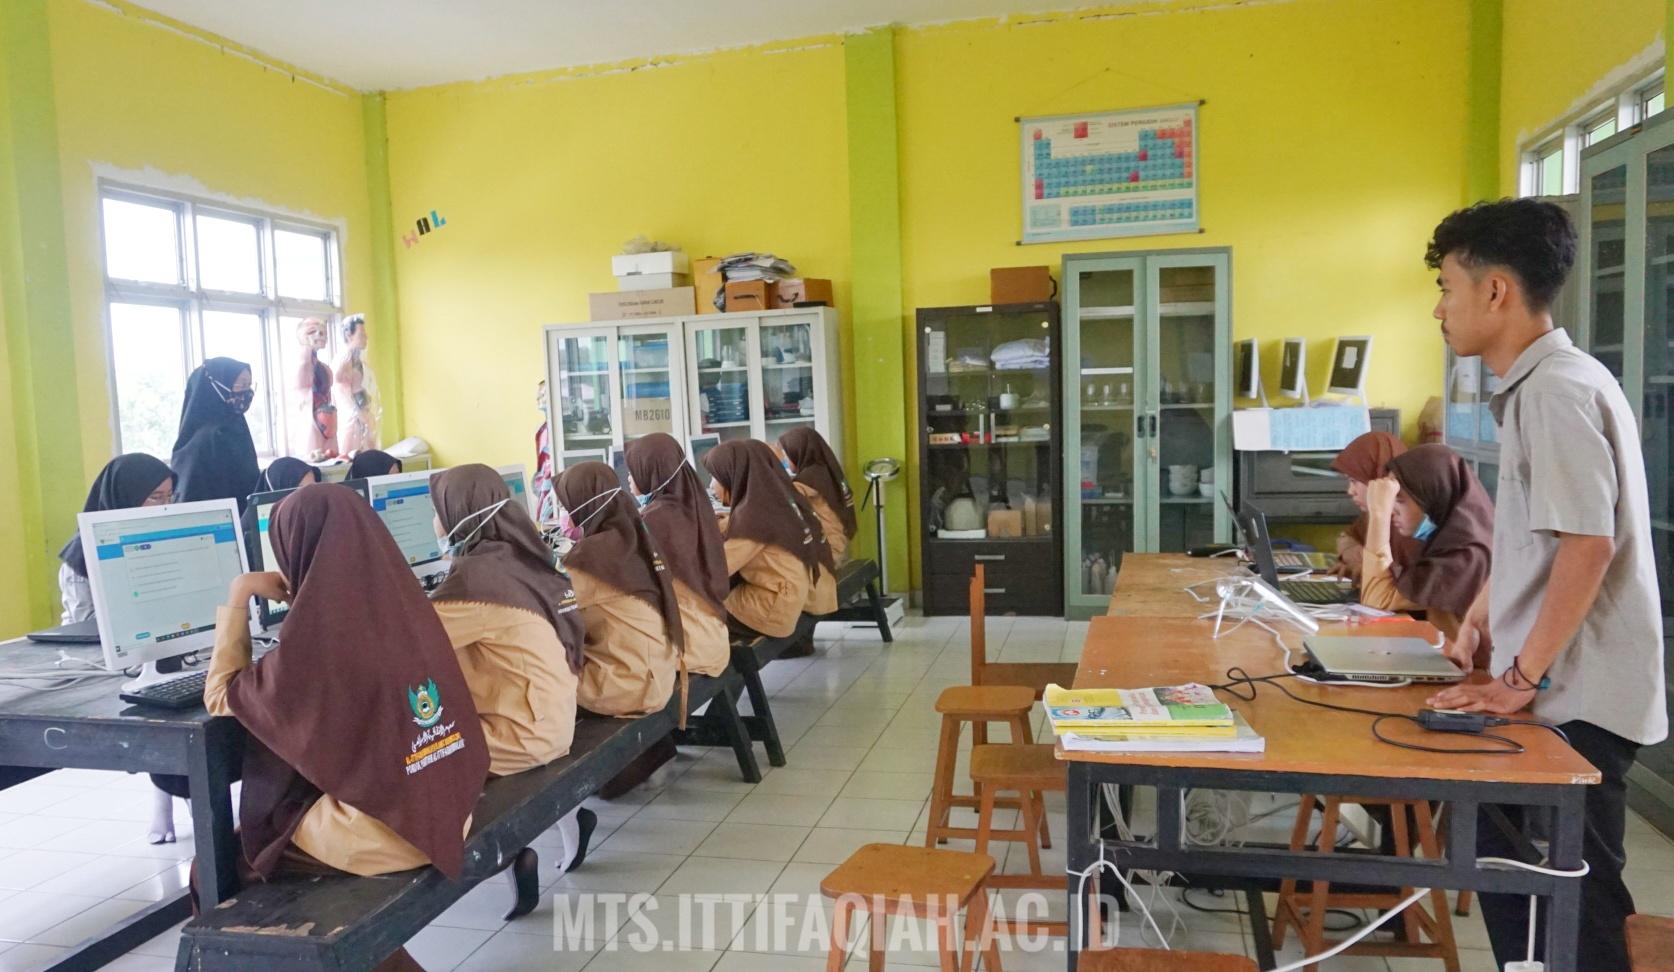 Simulasi UM-BK Santri Kelas Akhir MTs Al-Ittifaqiah